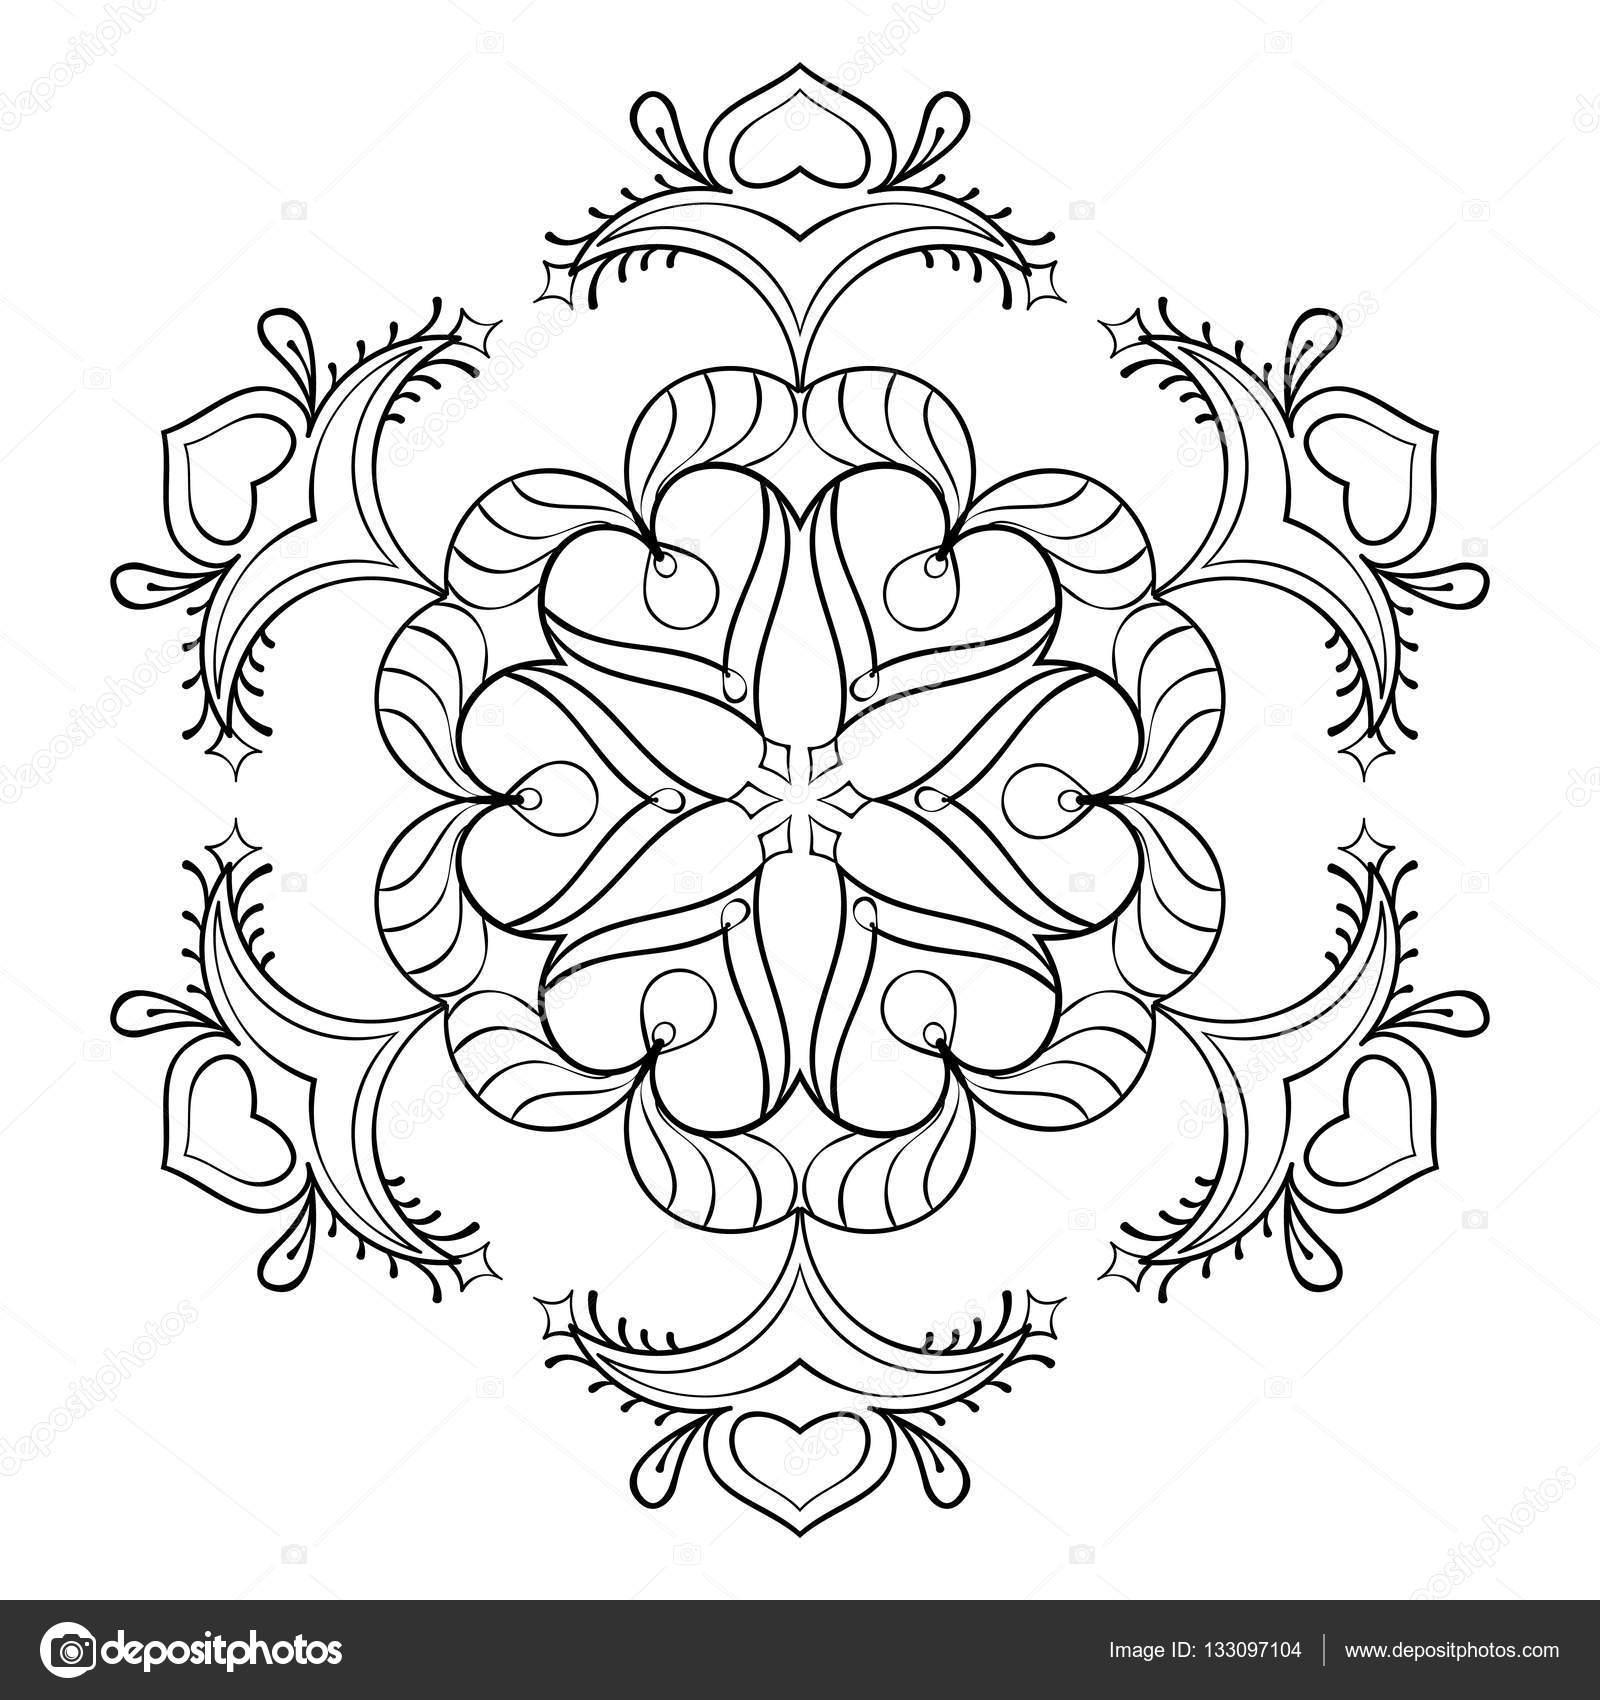 Disegni Di Natale Da Colorare Per Adulti.Fiocco Di Neve Zentangle Vettoriale Elegante Mandala Per